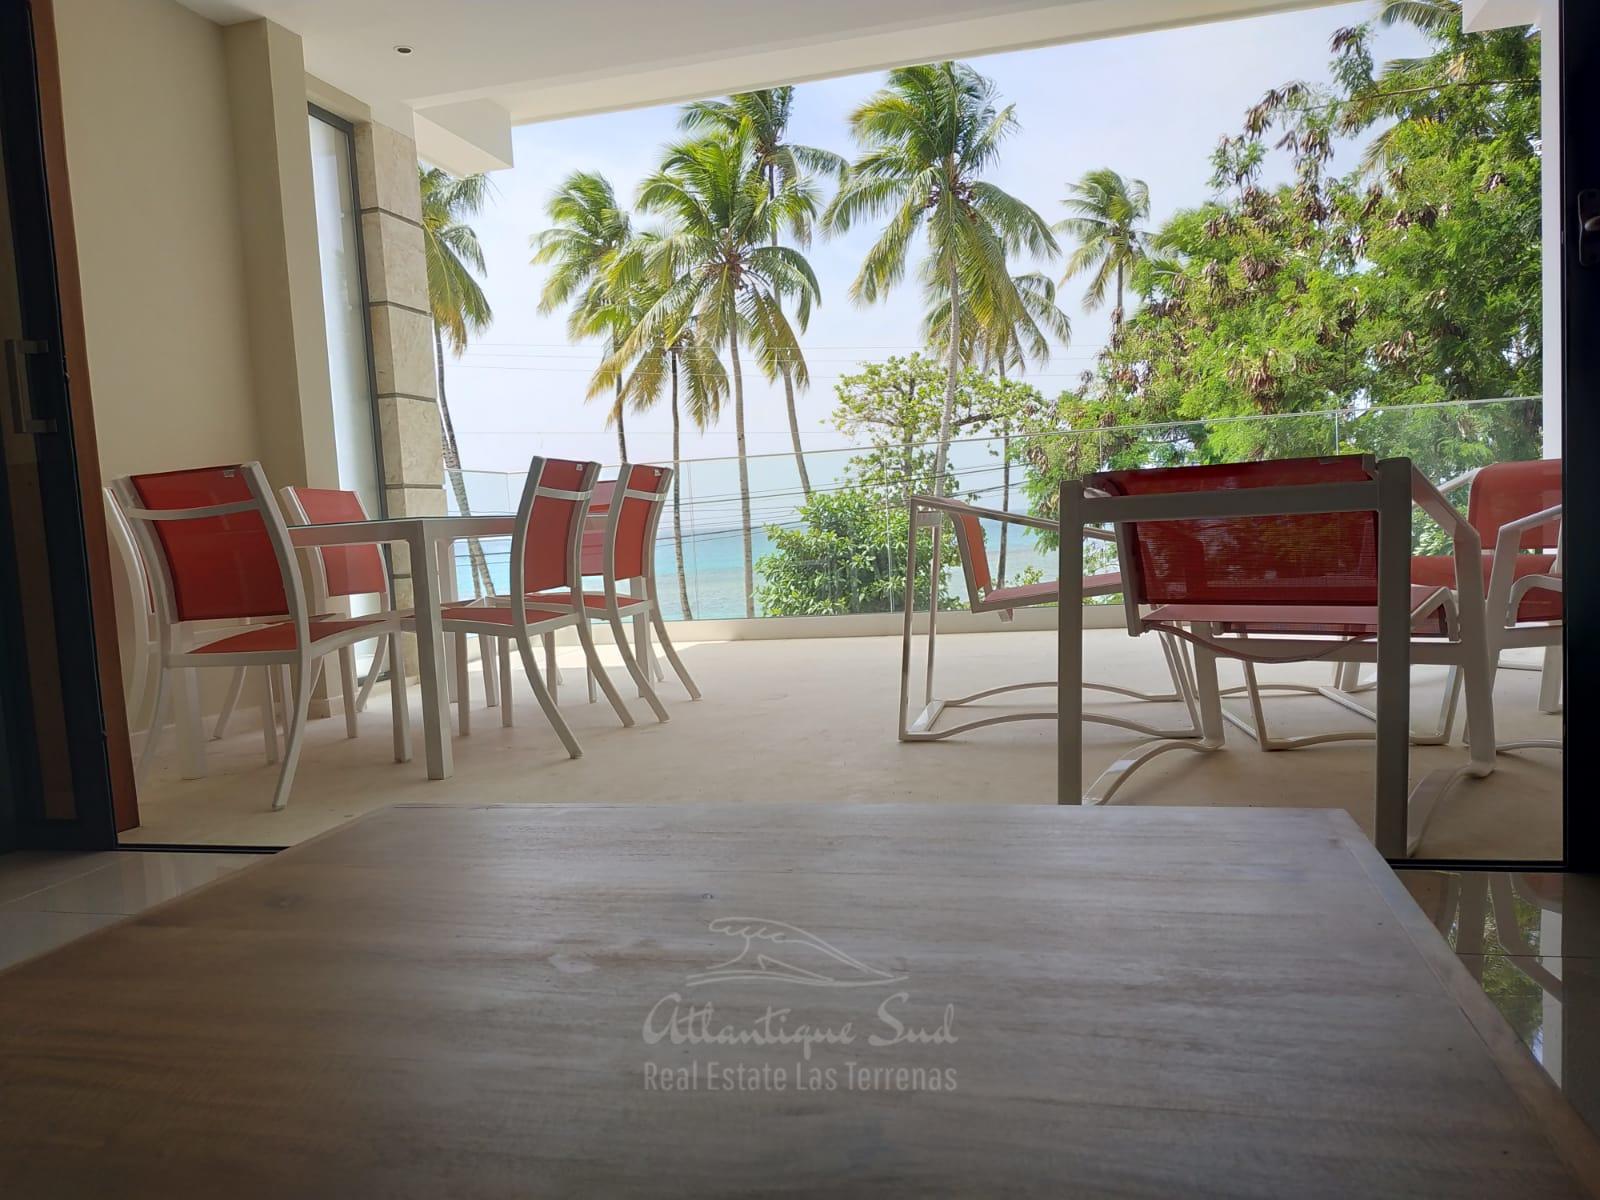 apartment for sale las terrenas beachfront condo9.jpg